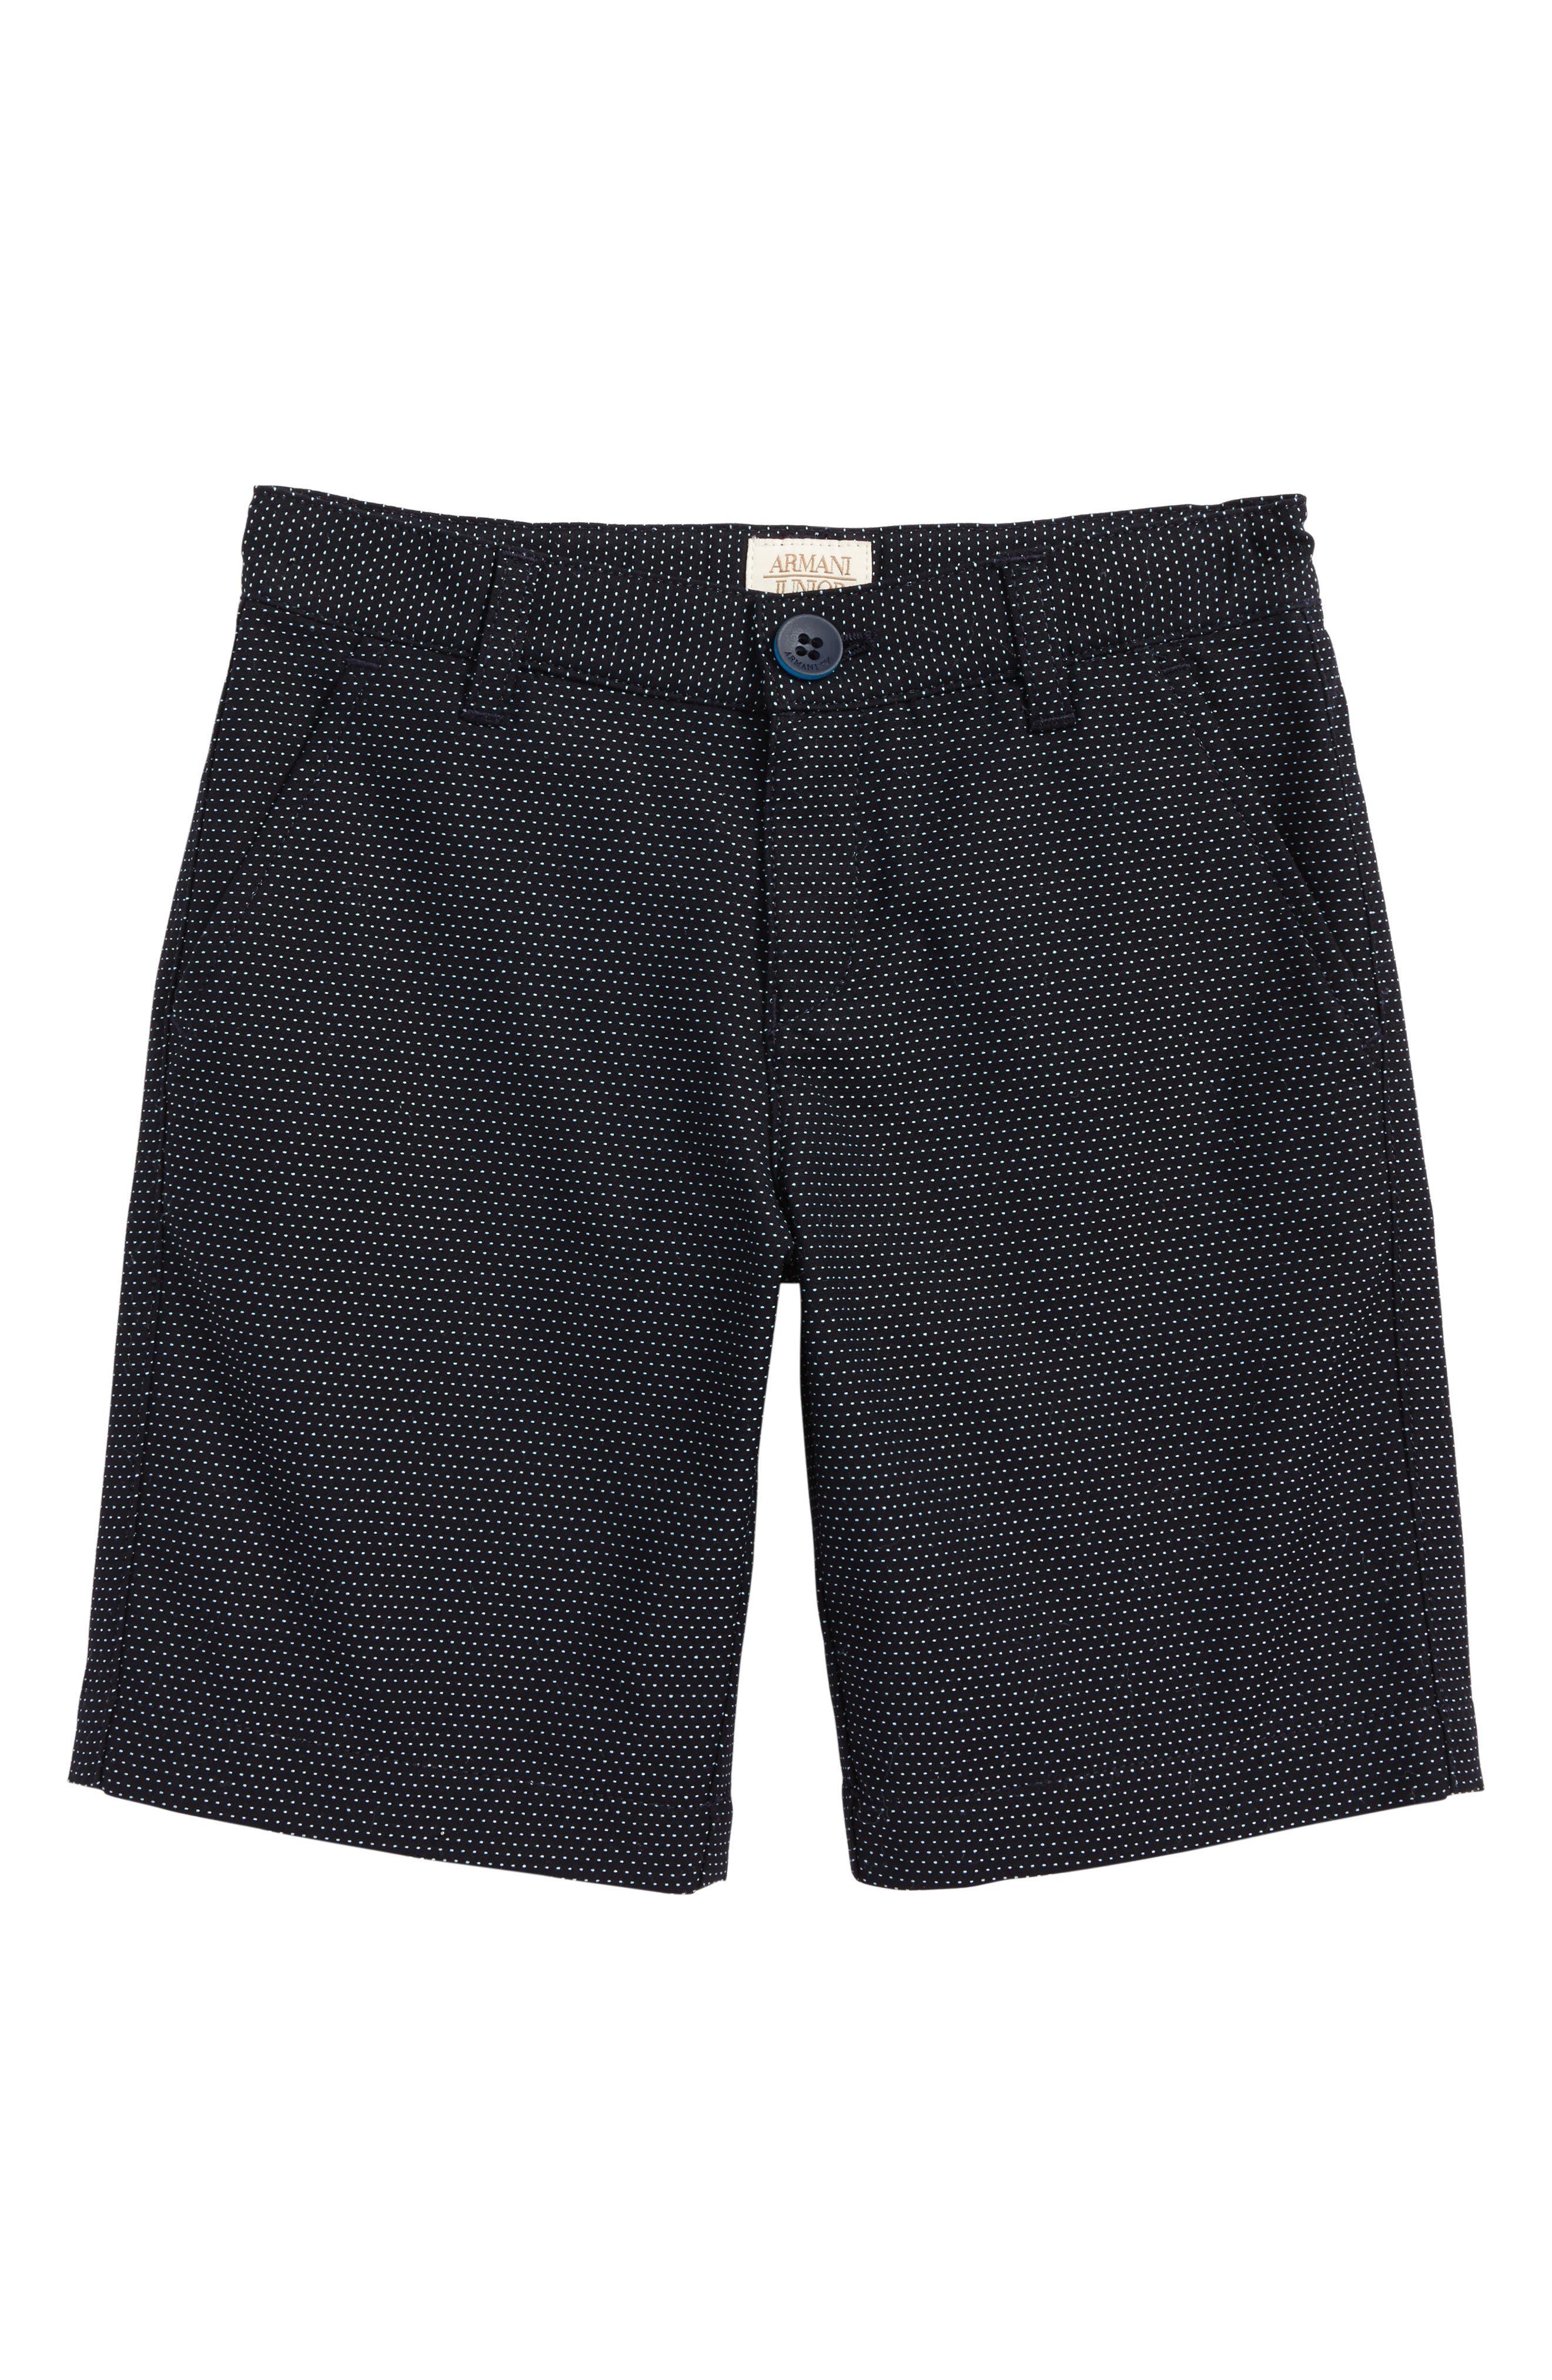 Microdot Shorts,                         Main,                         color, Dark Blue